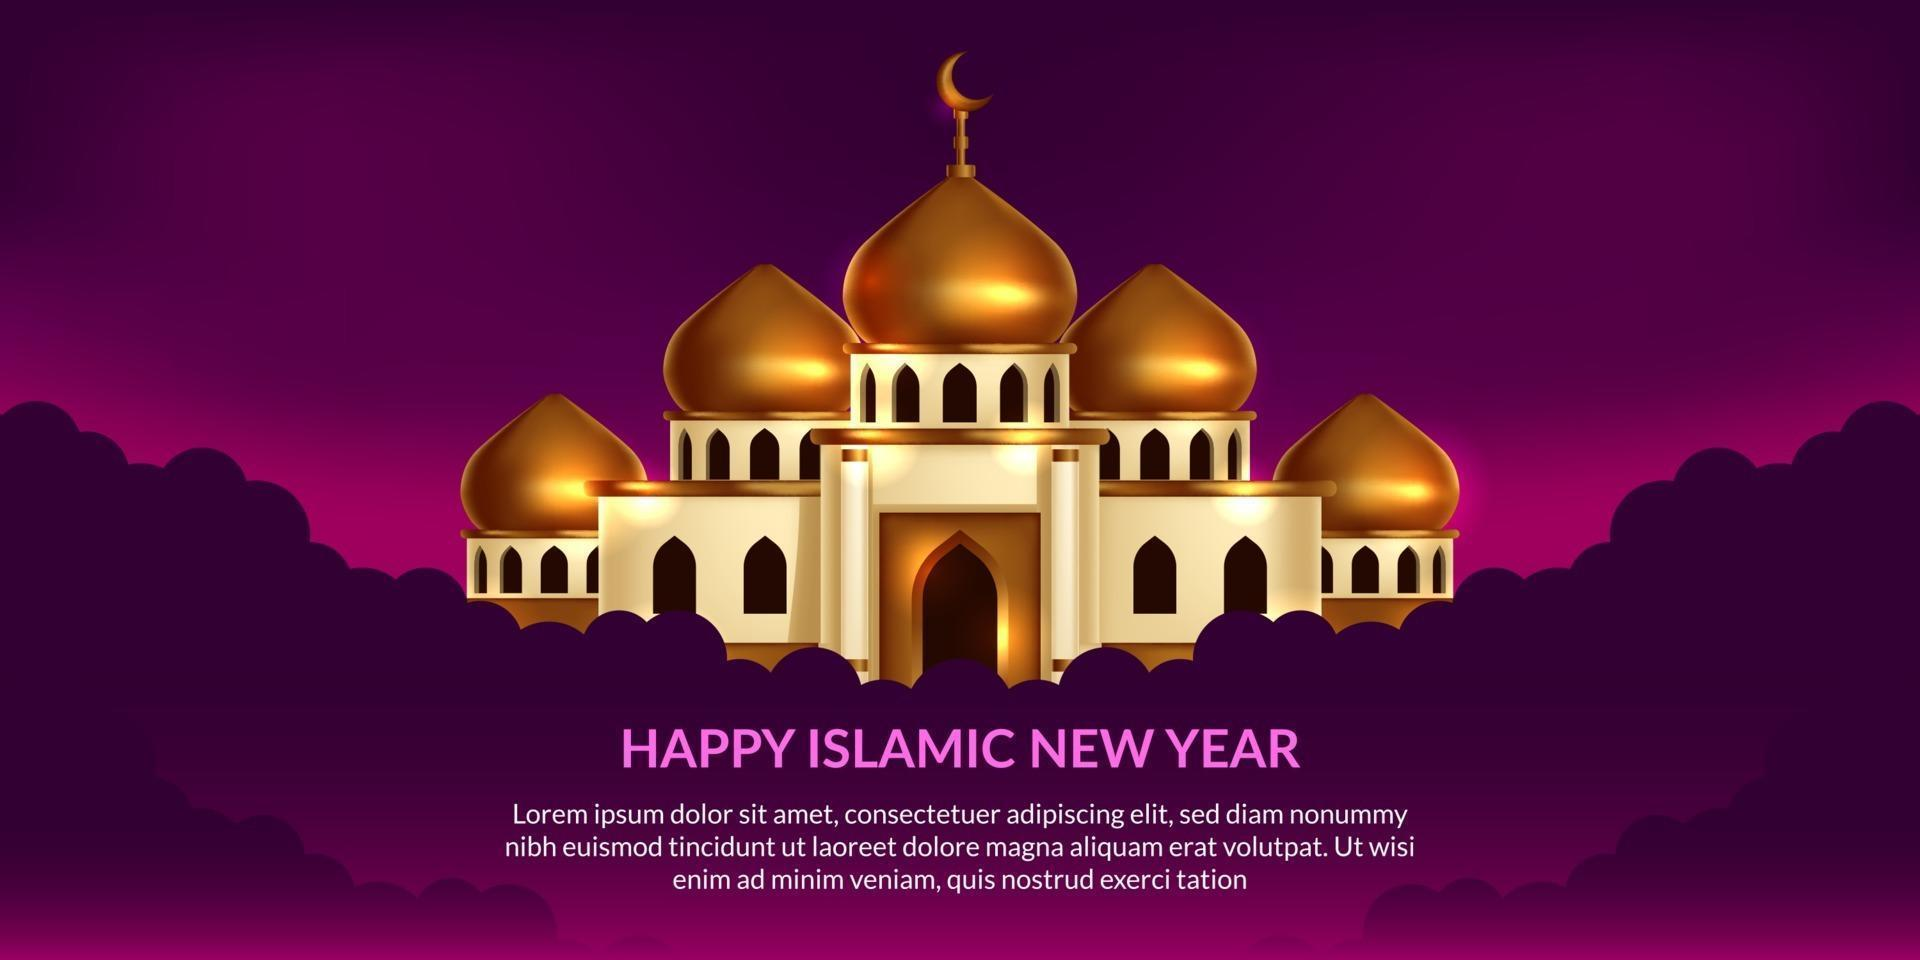 islamiskt nytt år. glad muharram. illustration av den gyllene kupolmoskén med lila bakgrund. vektor